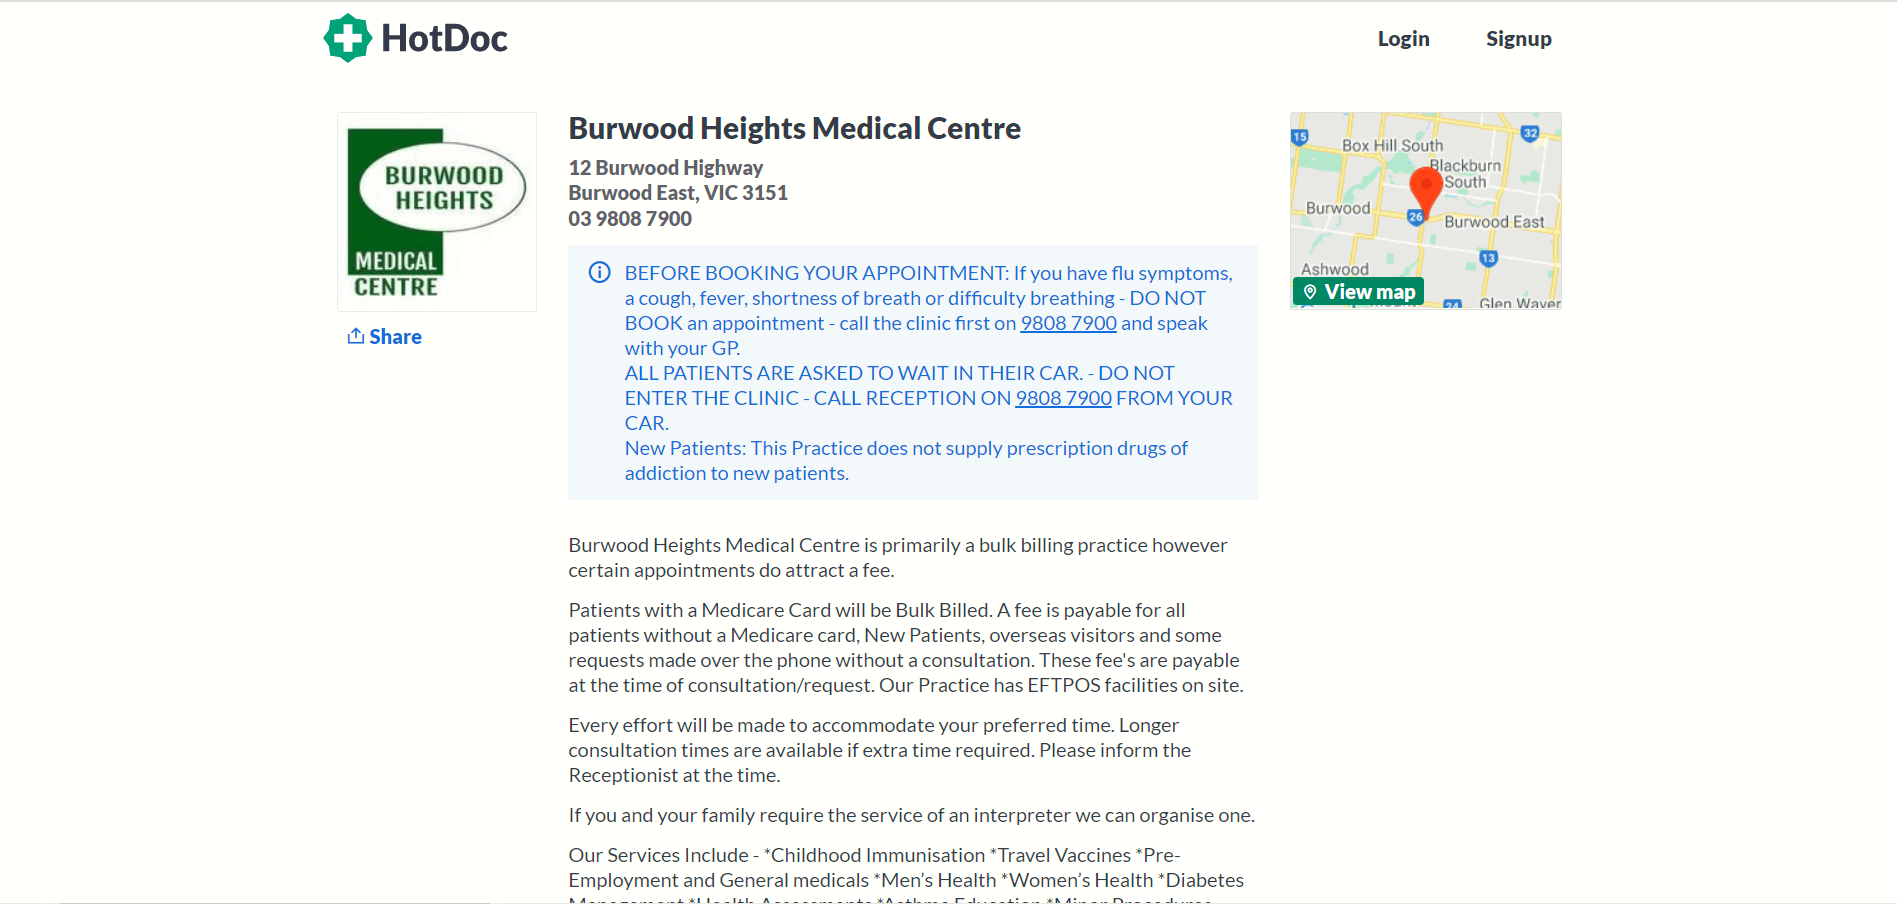 Burwood Heights Medical Centre